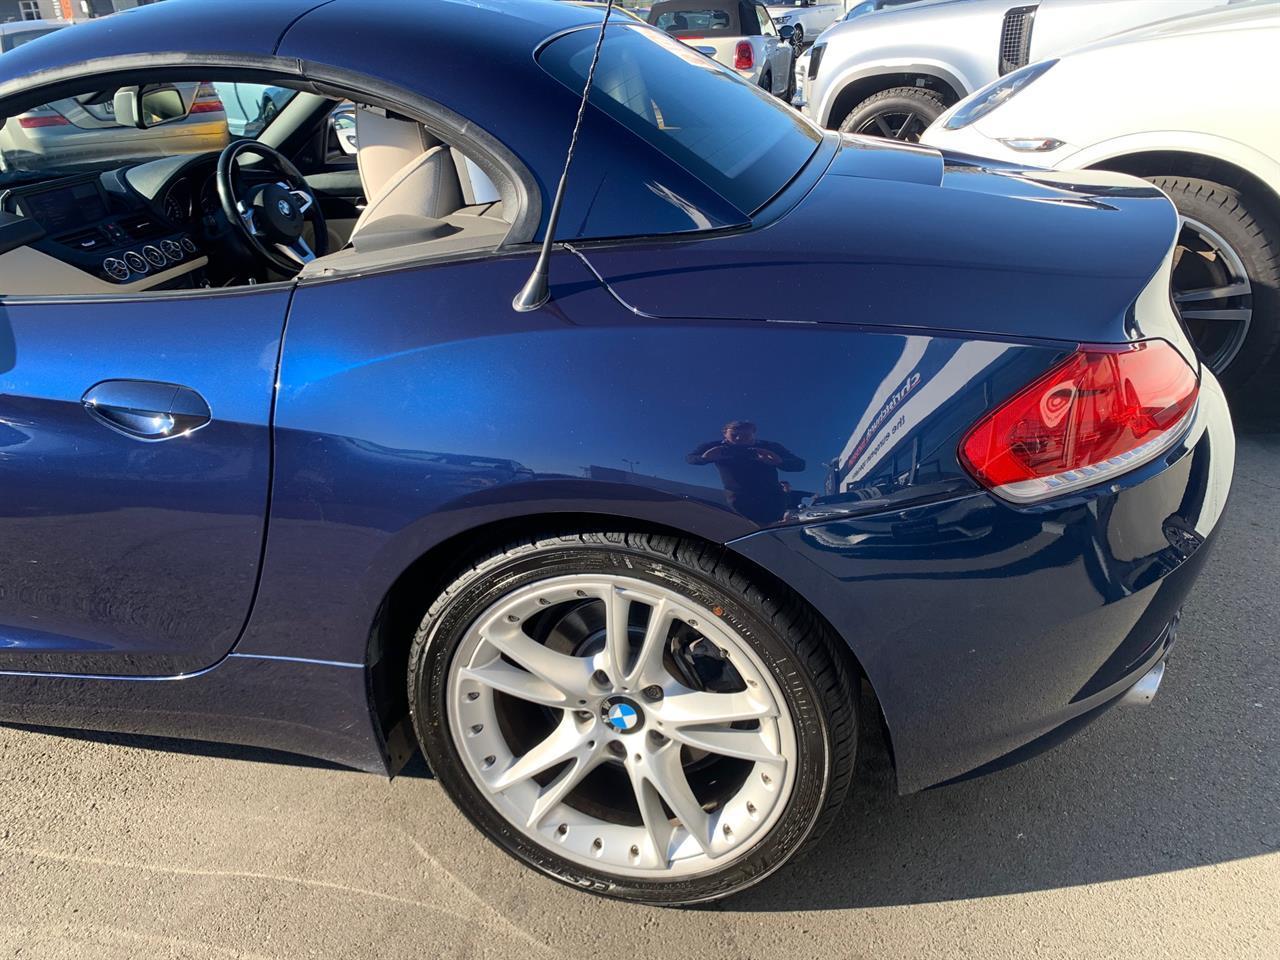 image-5, 2009 BMW Z4 SDrive Hardtop New Shape Convertible at Christchurch